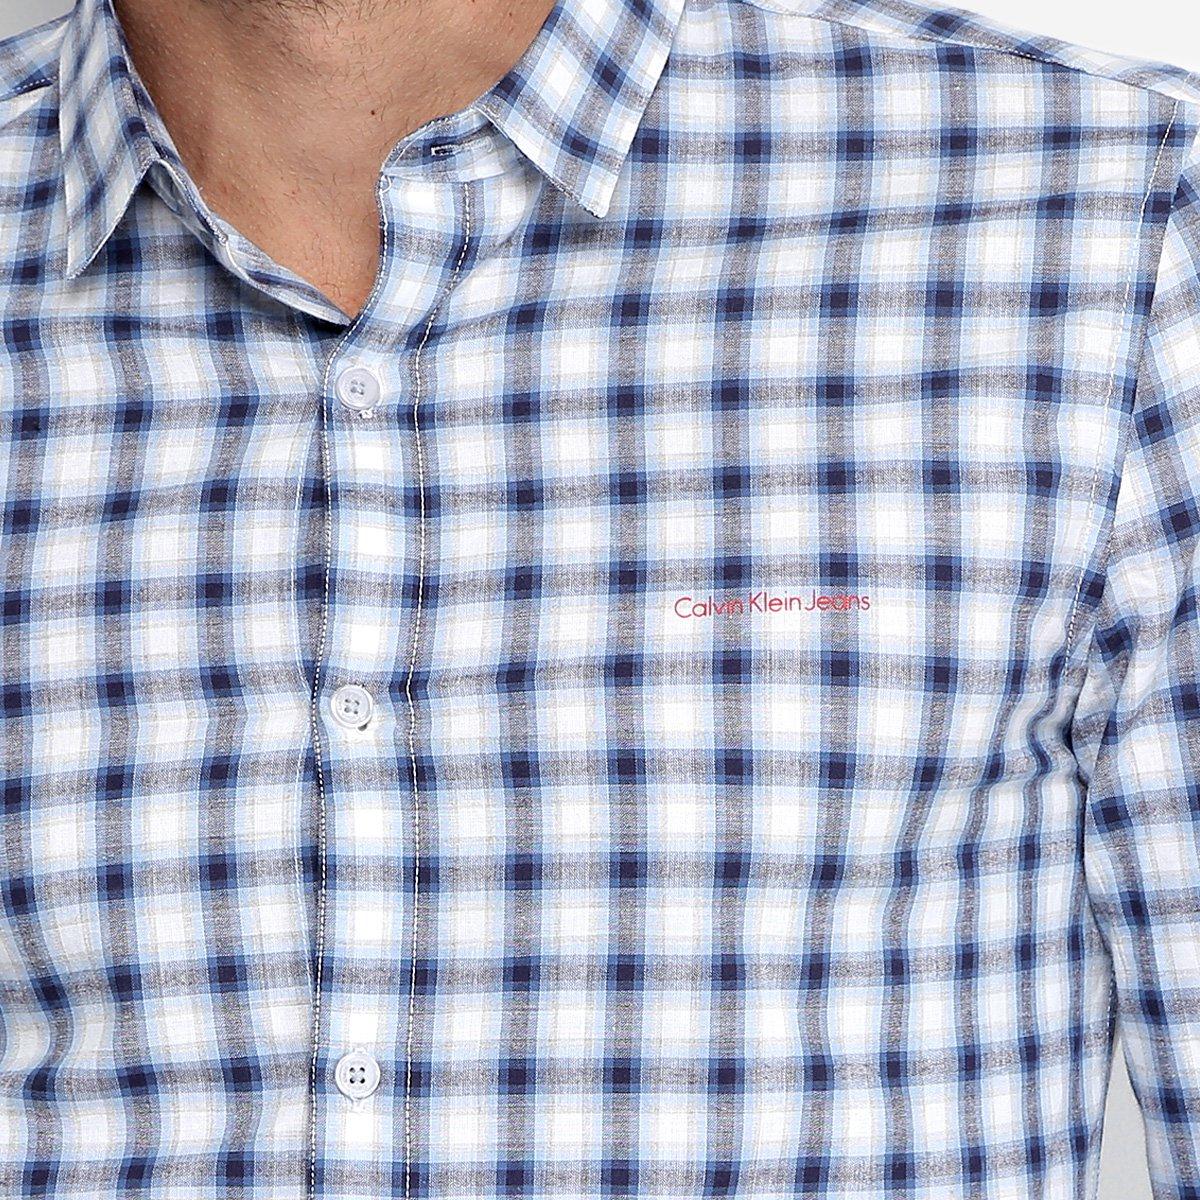 Camisa Xadrez Calvin Klein Slim Fit Masculina - Compre Agora   Zattini 040faf20c1